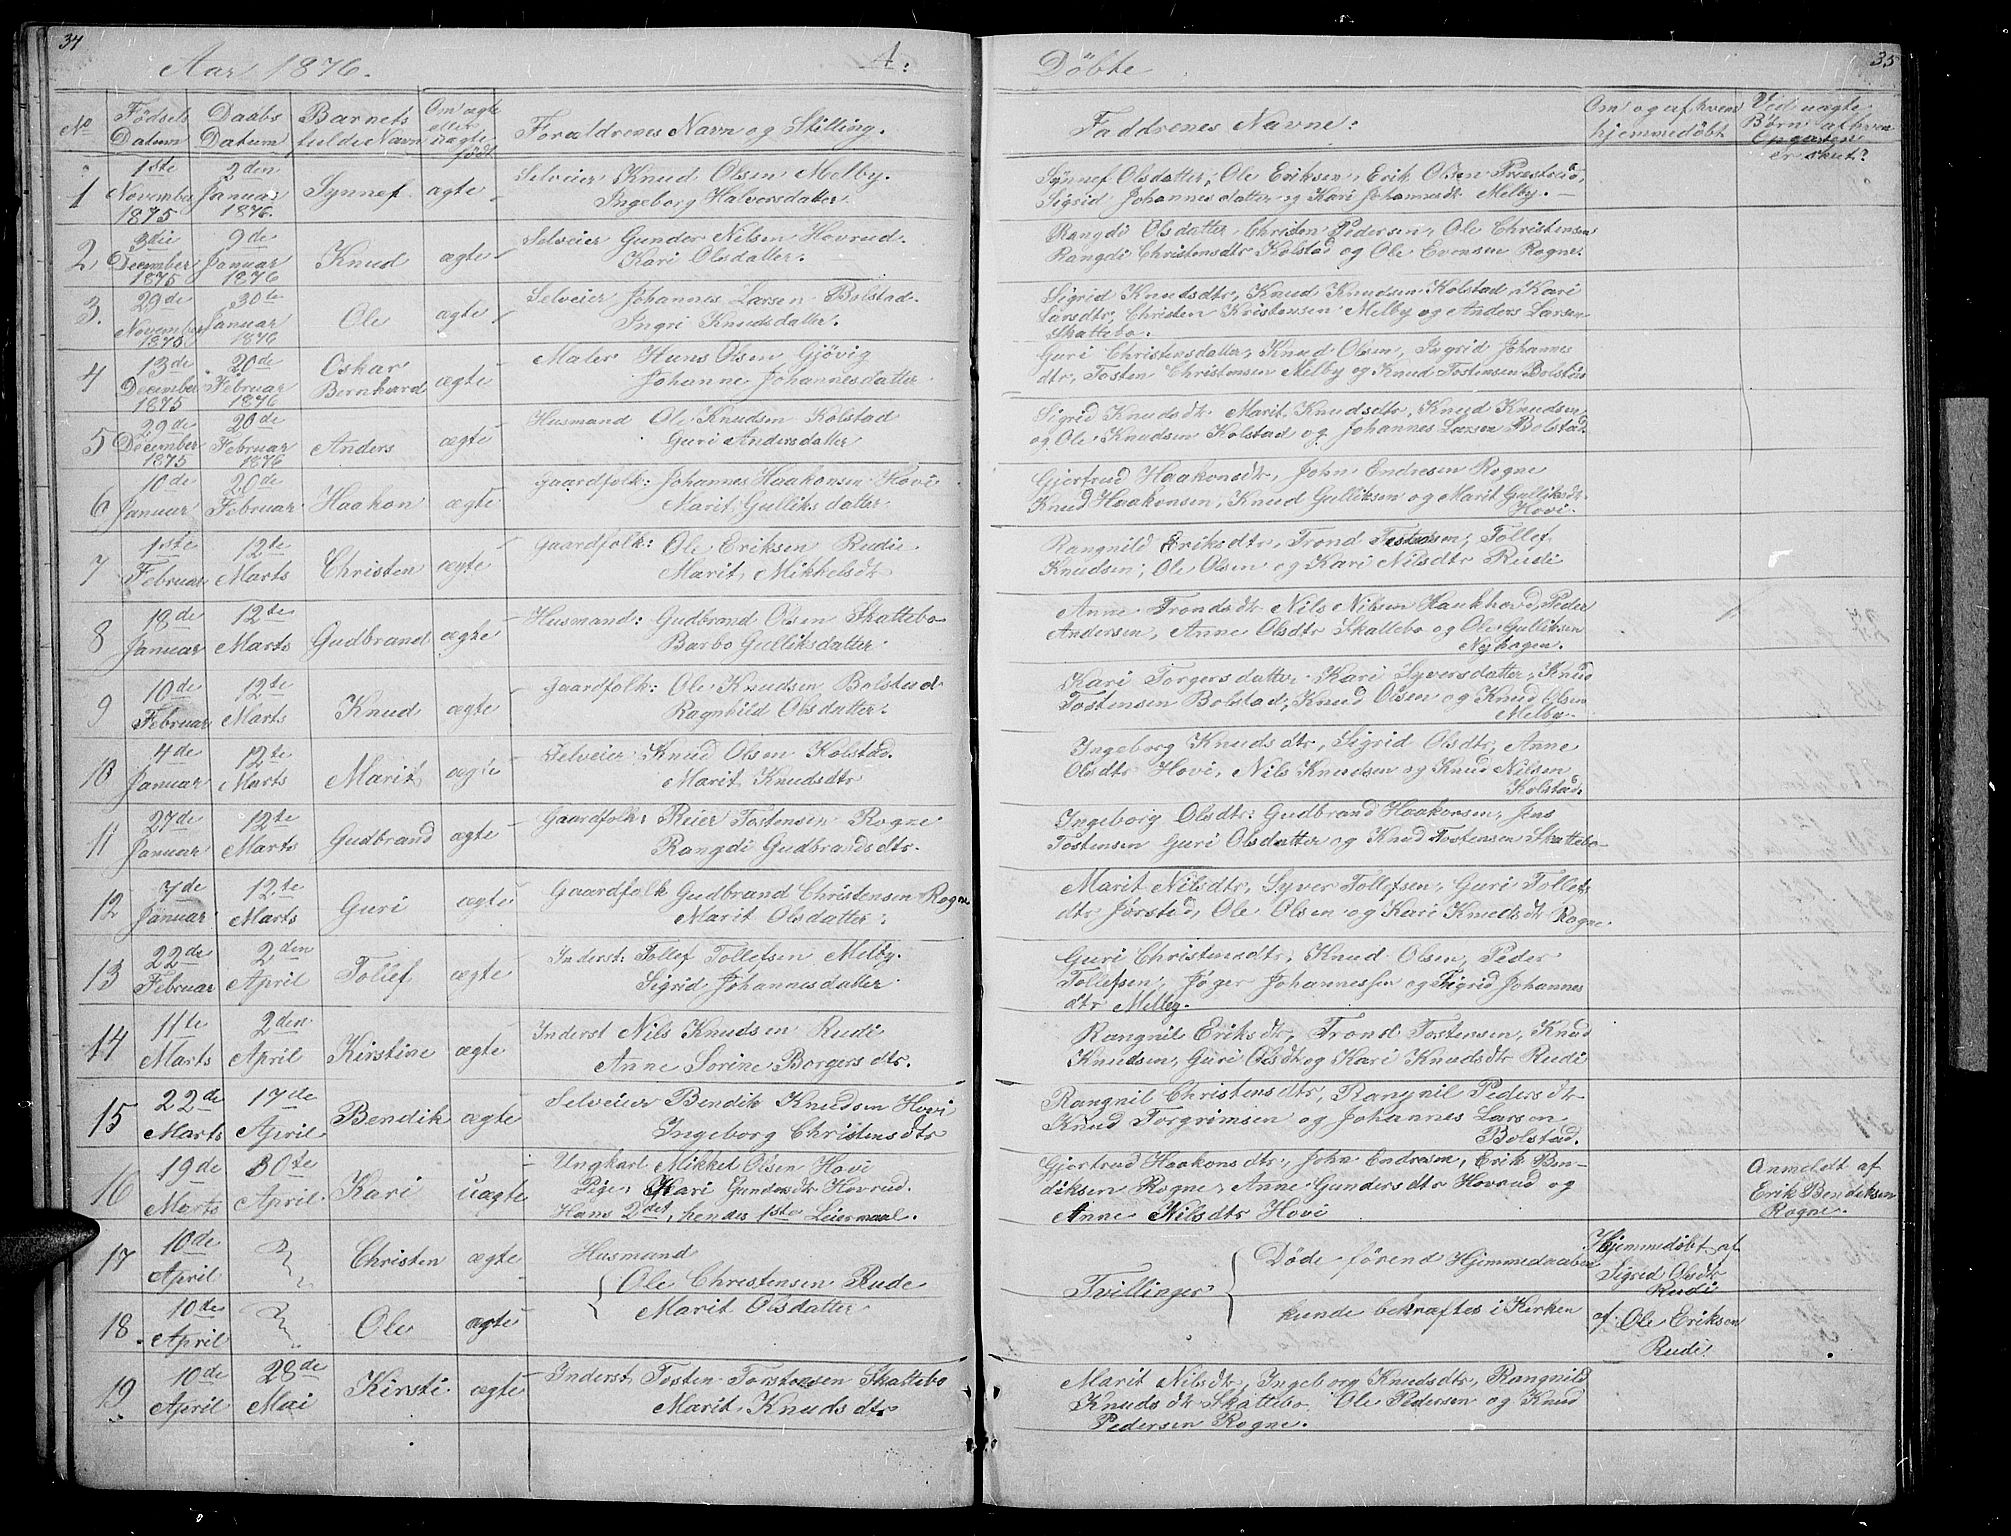 SAH, Øystre Slidre prestekontor, Klokkerbok nr. 3, 1866-1886, s. 34-35